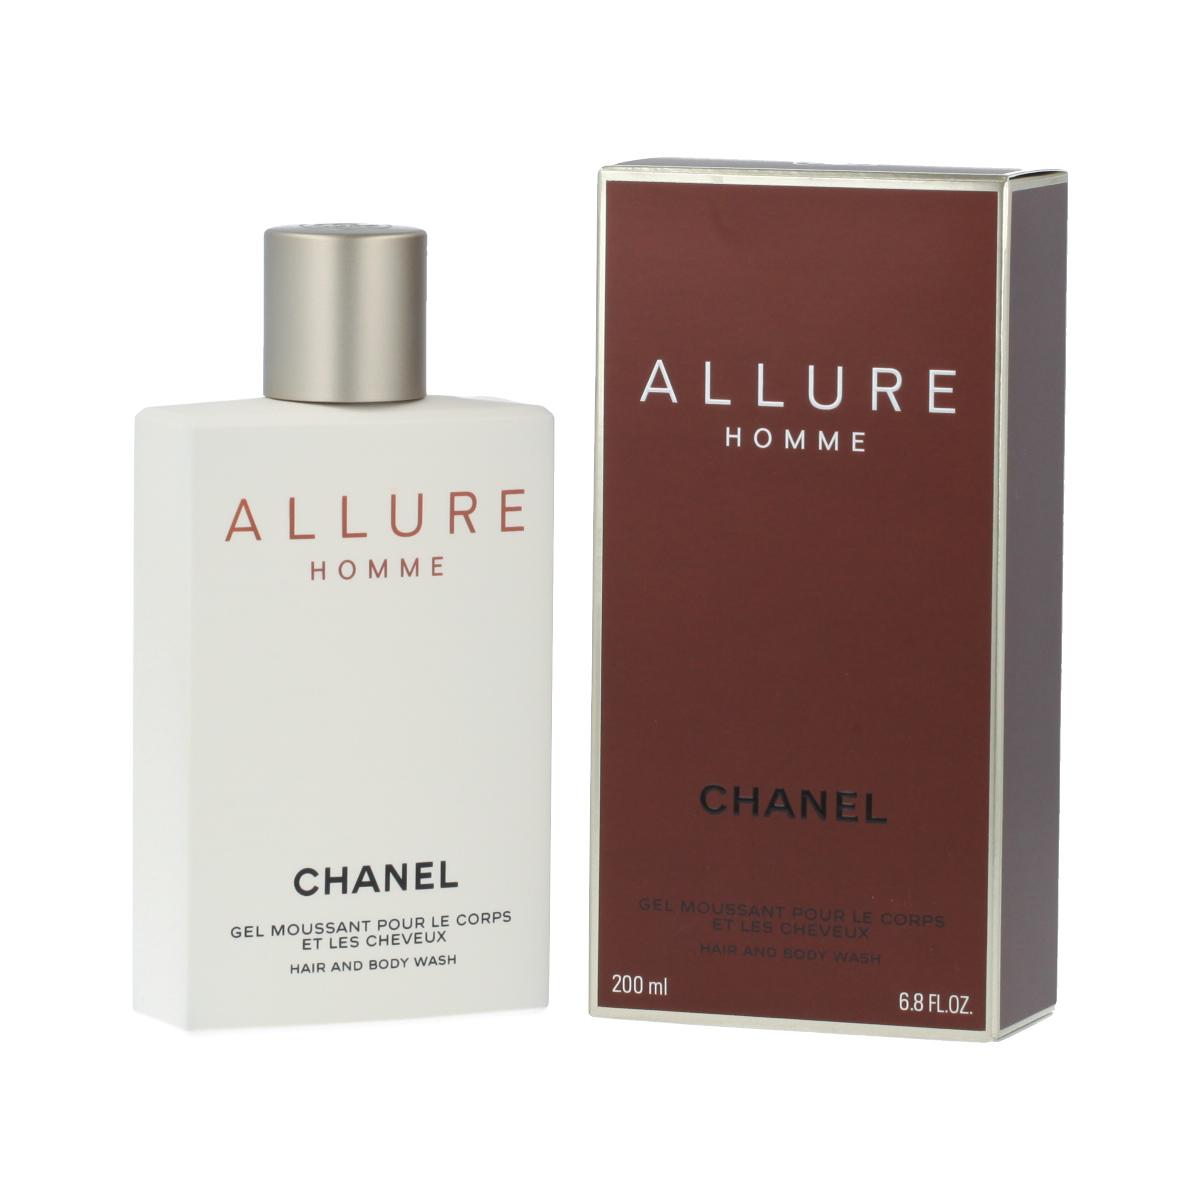 Chanel Allure Homme SG 200 ml M